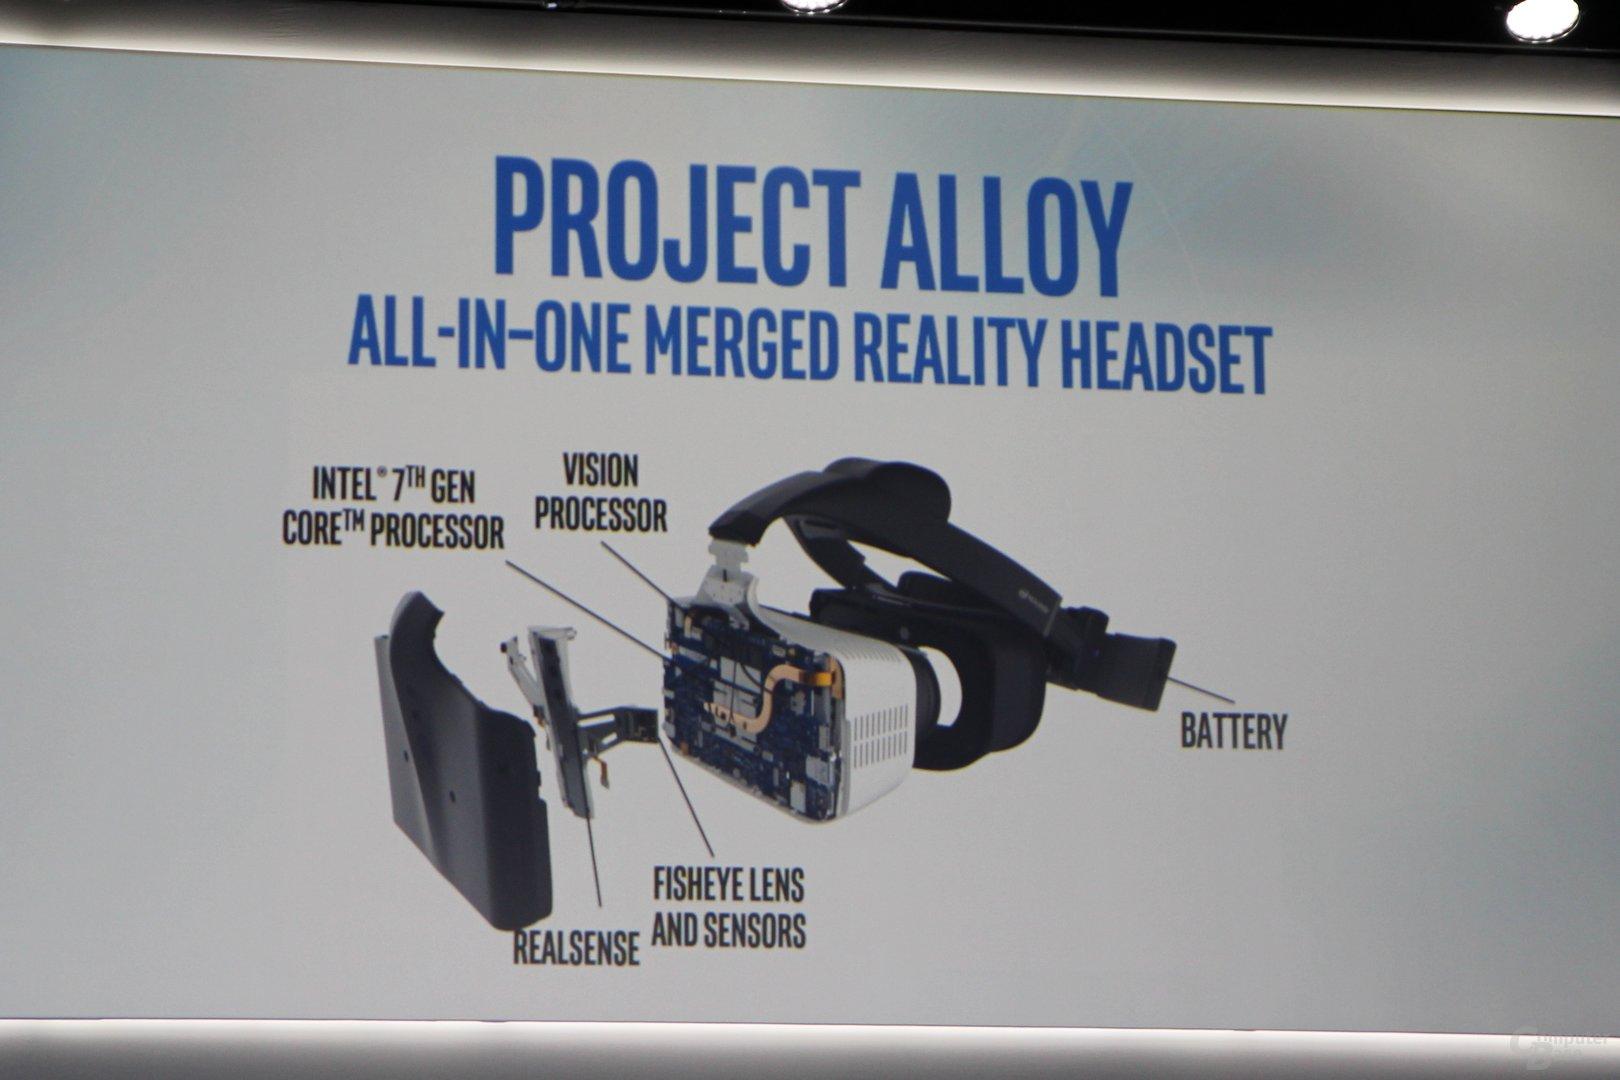 Intels Project Alloy mit aktualisierter Hardware